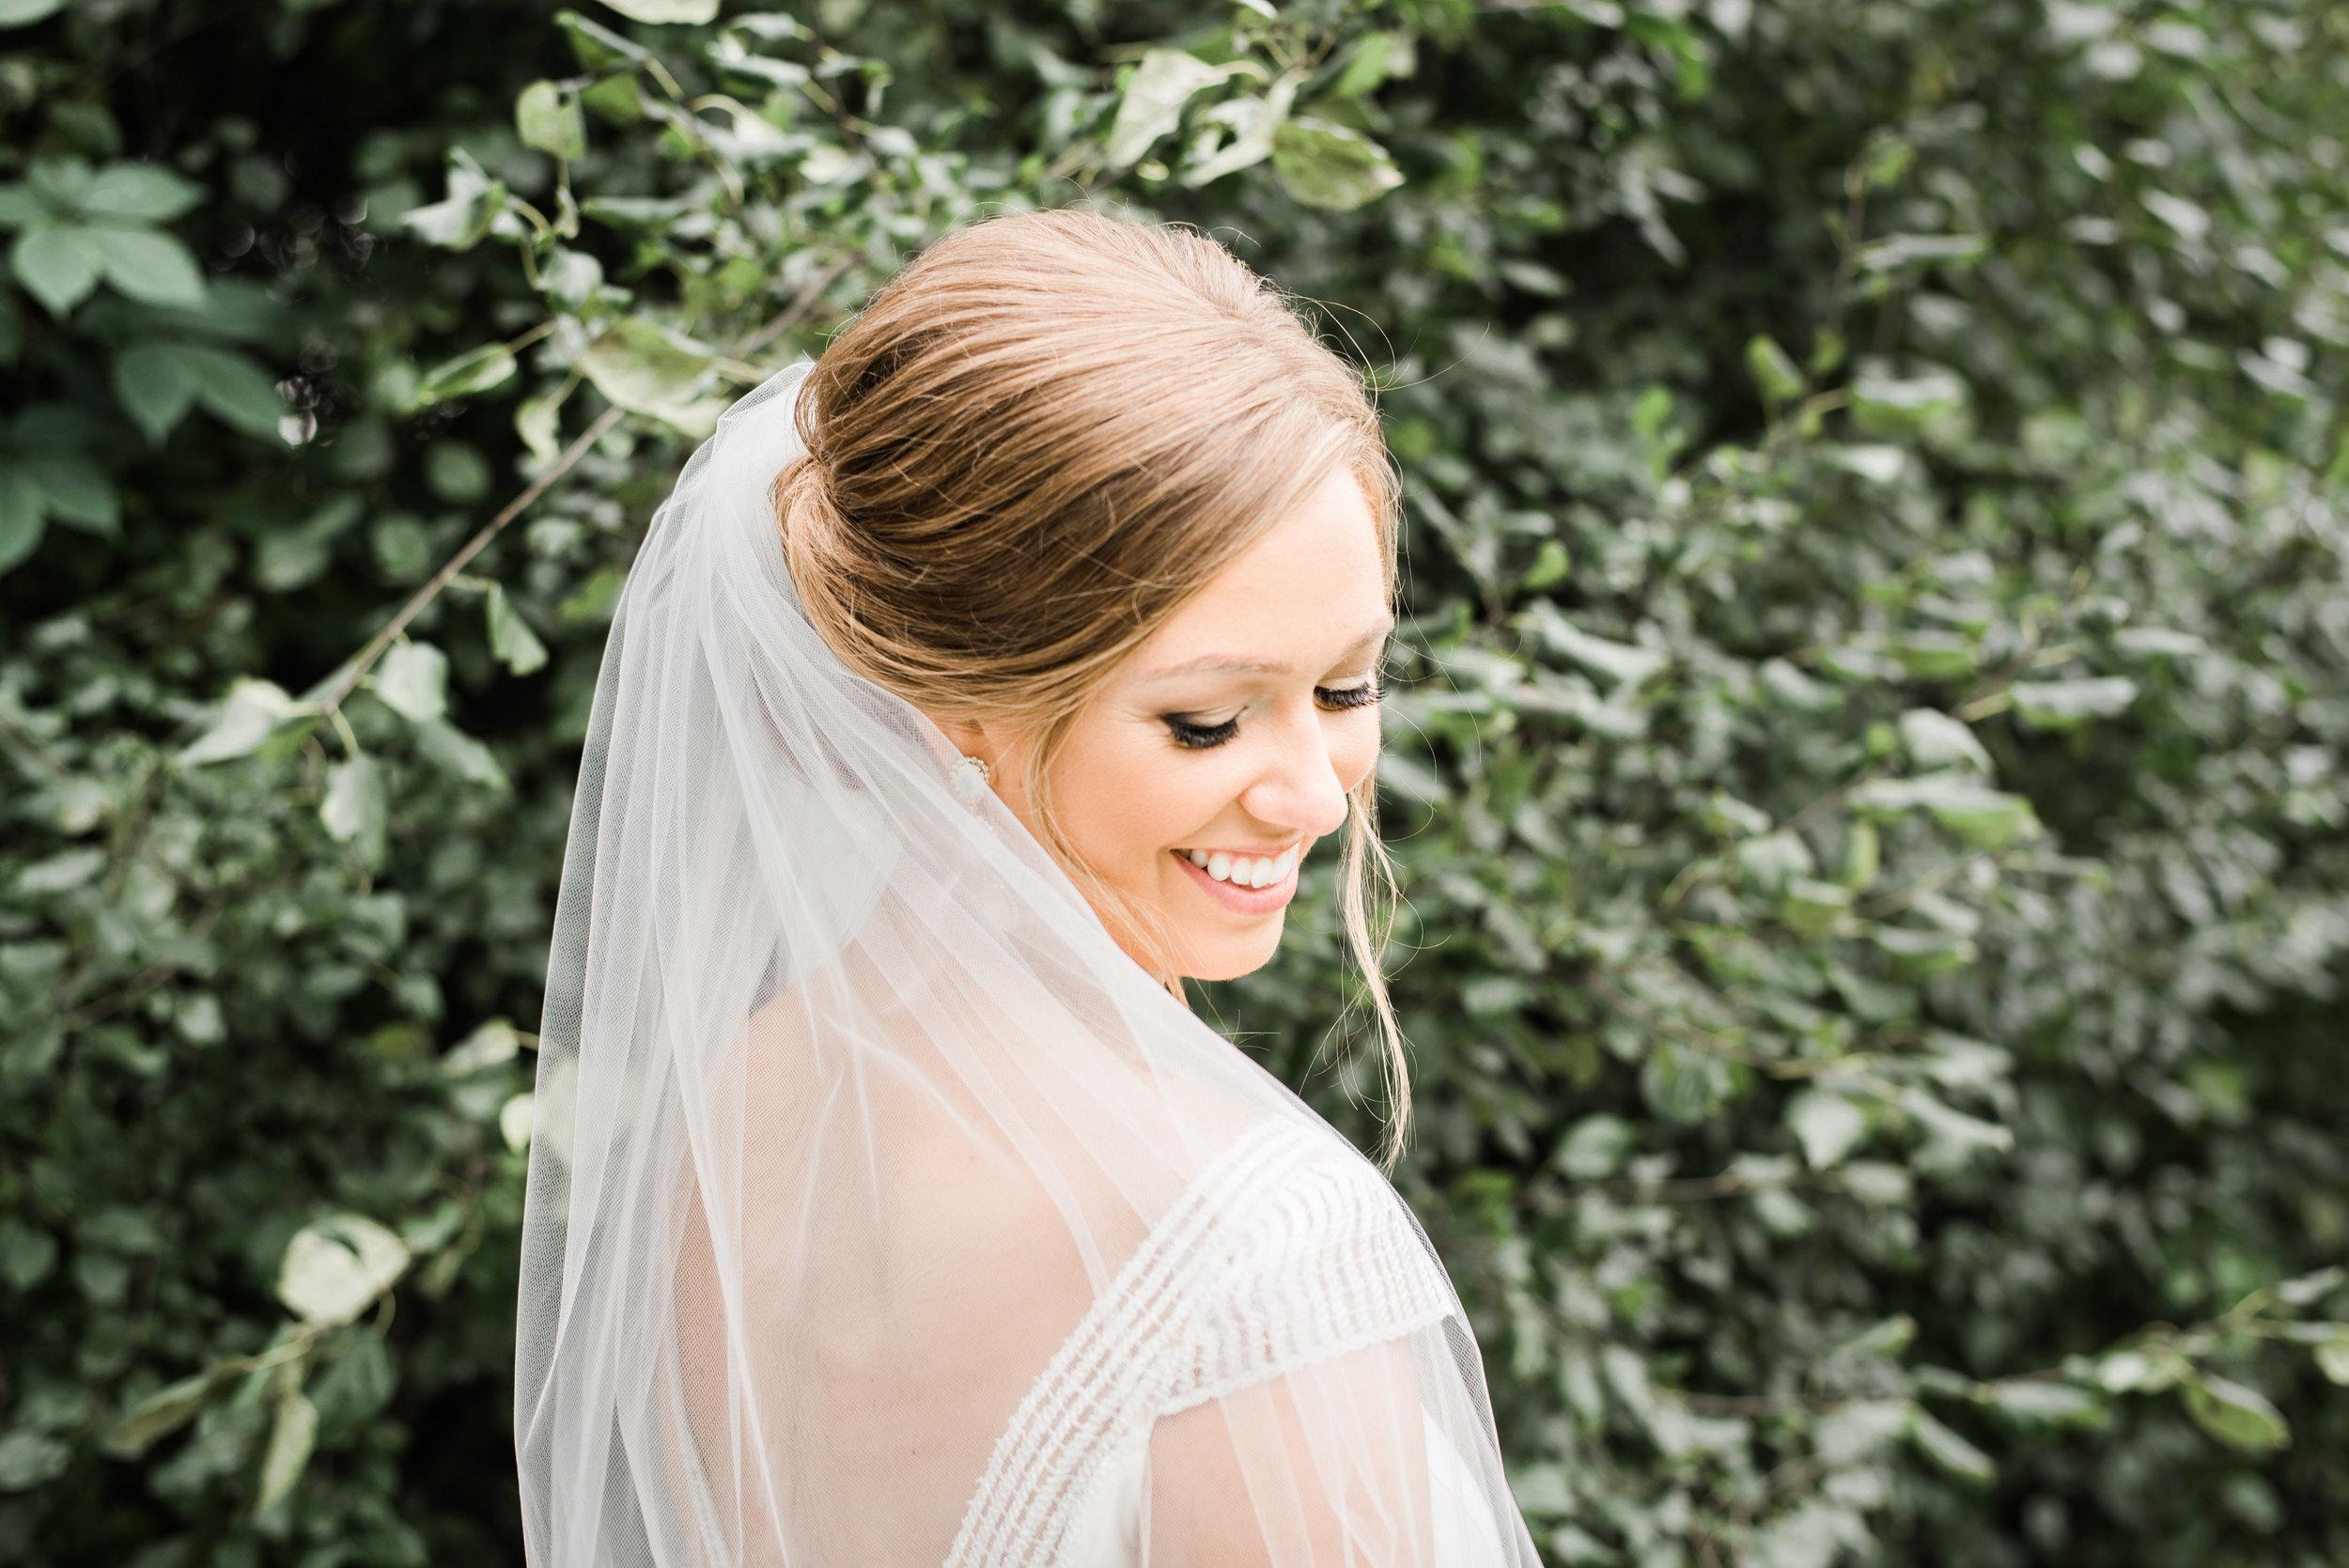 gray-door-photography-wedding-photographer-steph-erffmeyer-dallas-destination-bridal6.jpg